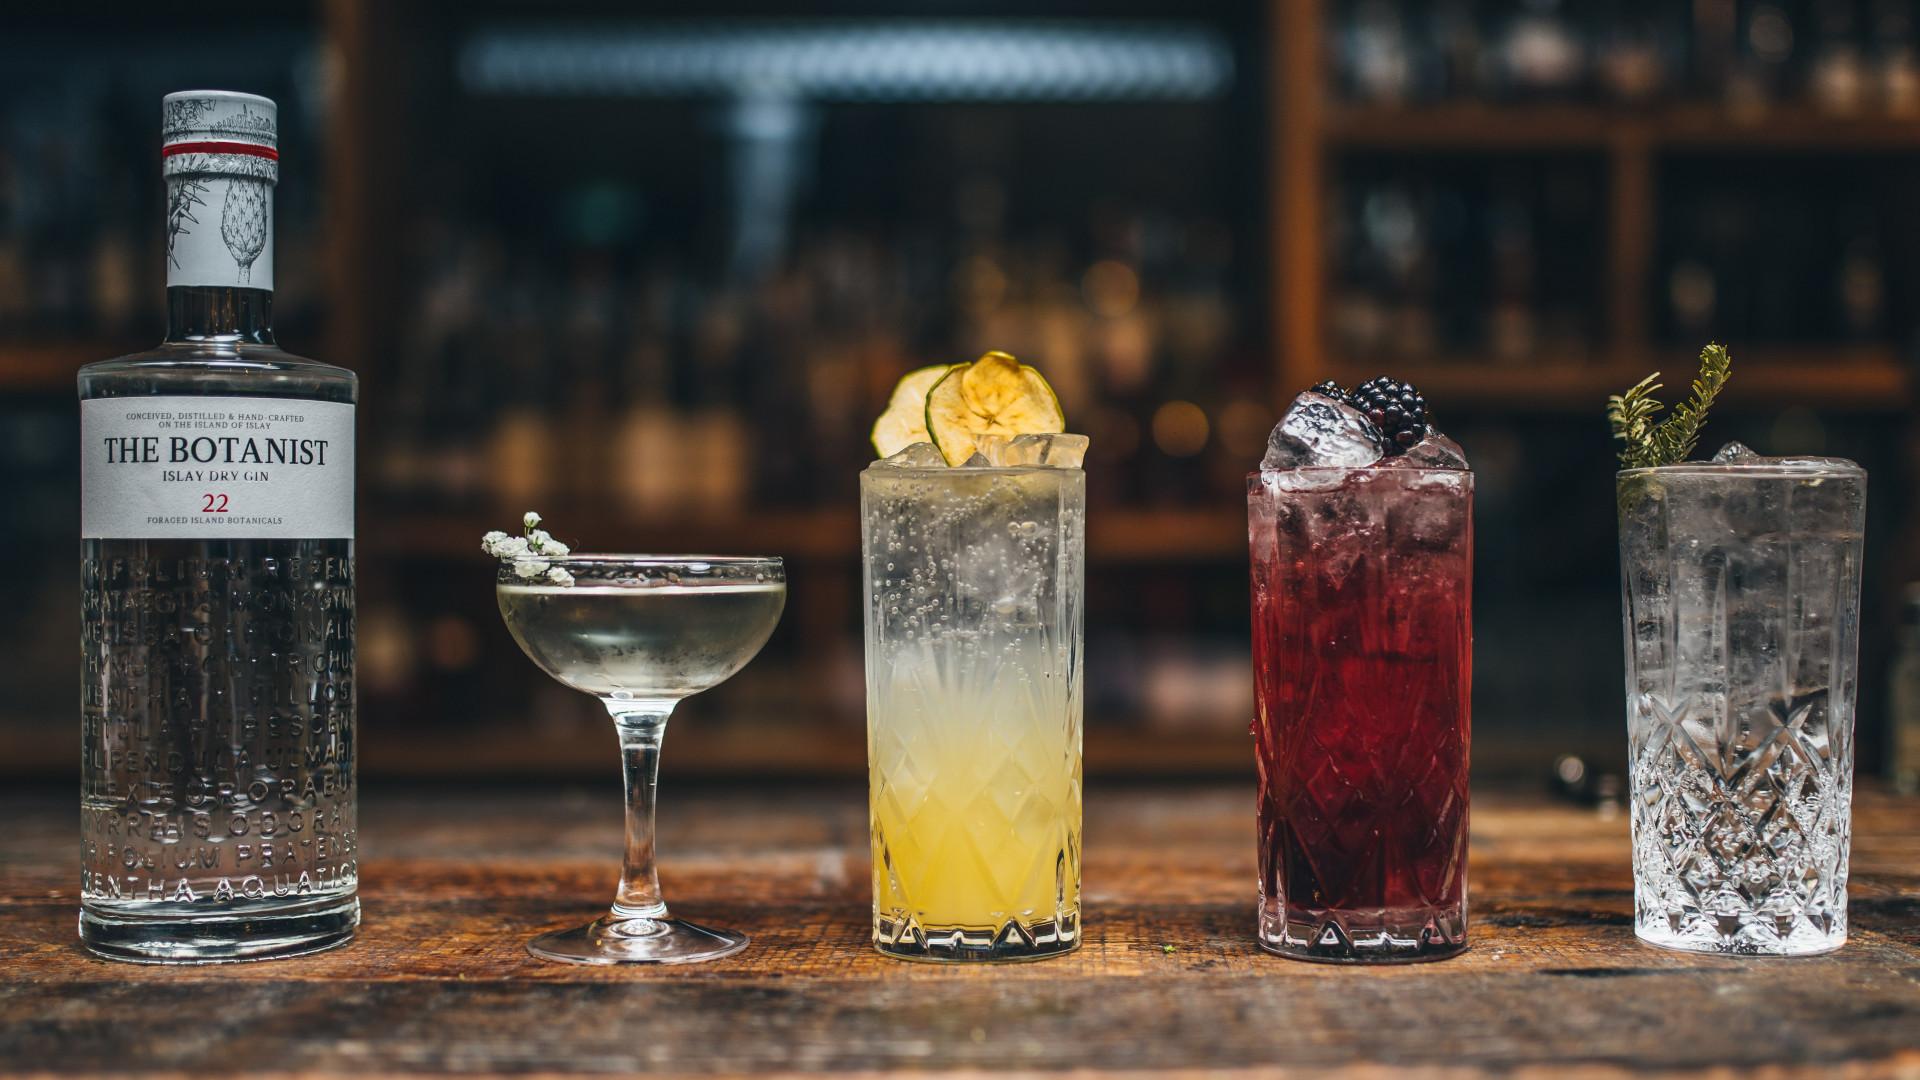 The Botanist's bar at Taste of London's festive edition